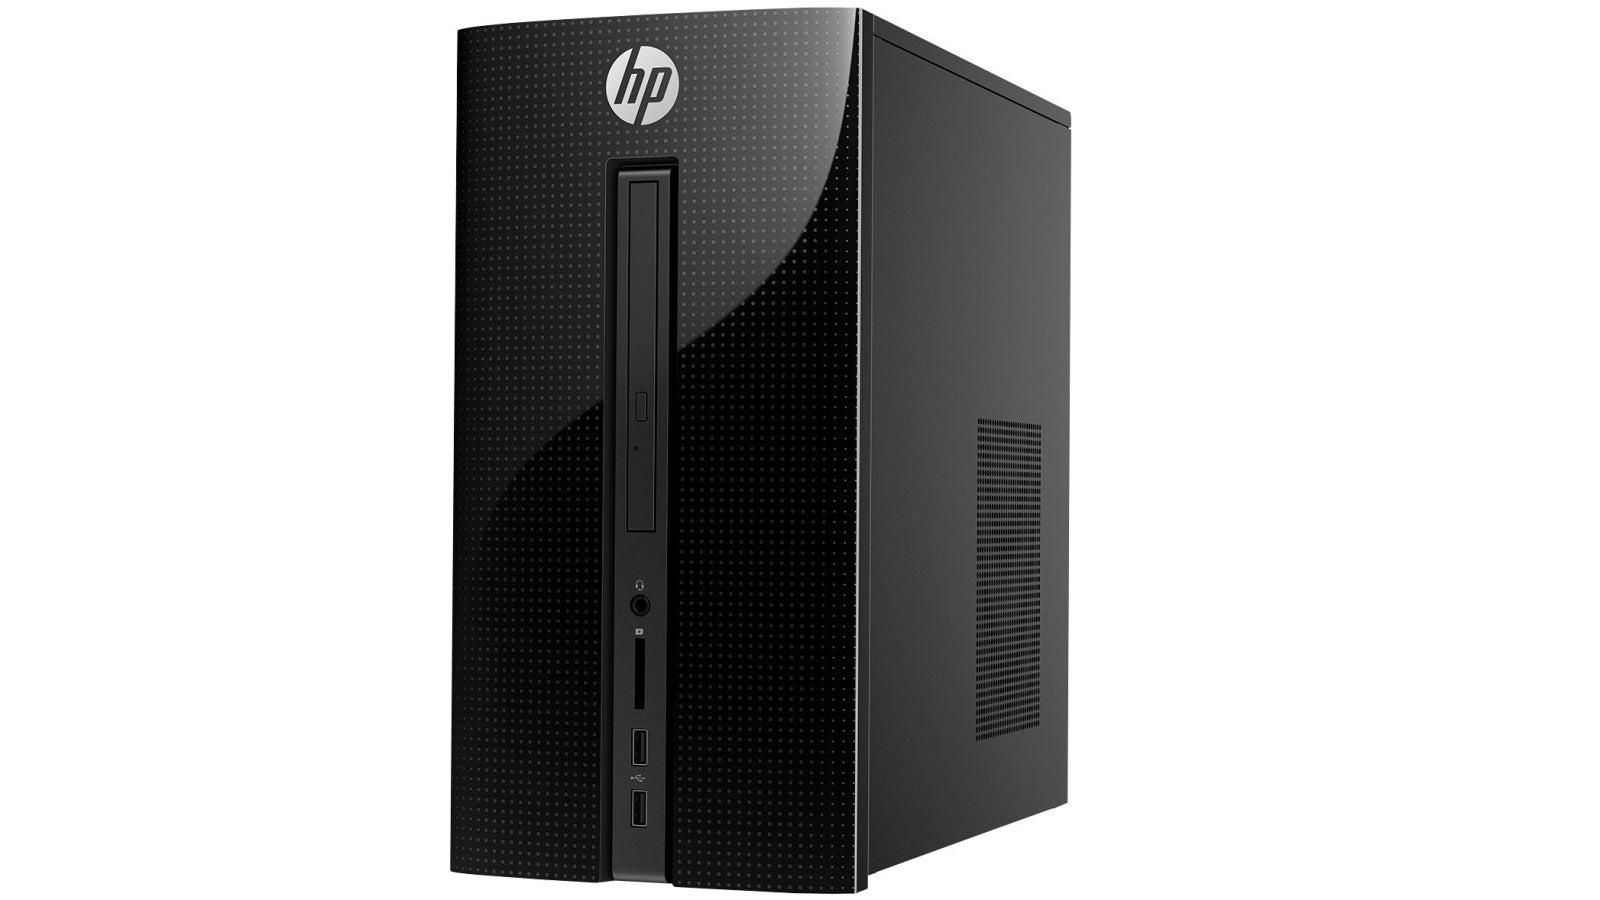 hp pavilion desktop 510 manual